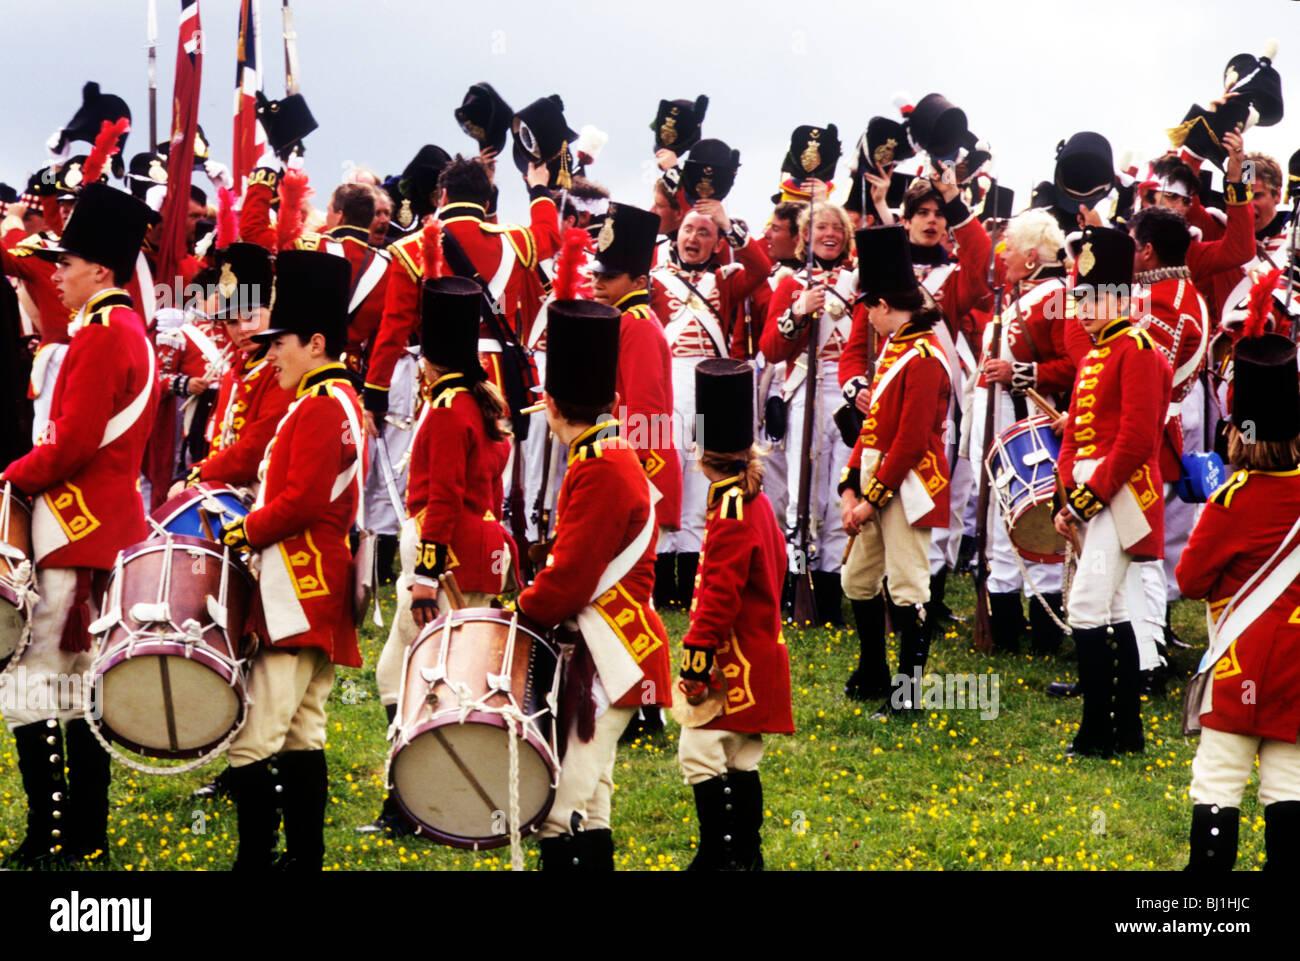 Historical re-enactment, British English redcoats 1815 military history uniform uniforms dress costume costumes - Stock Image